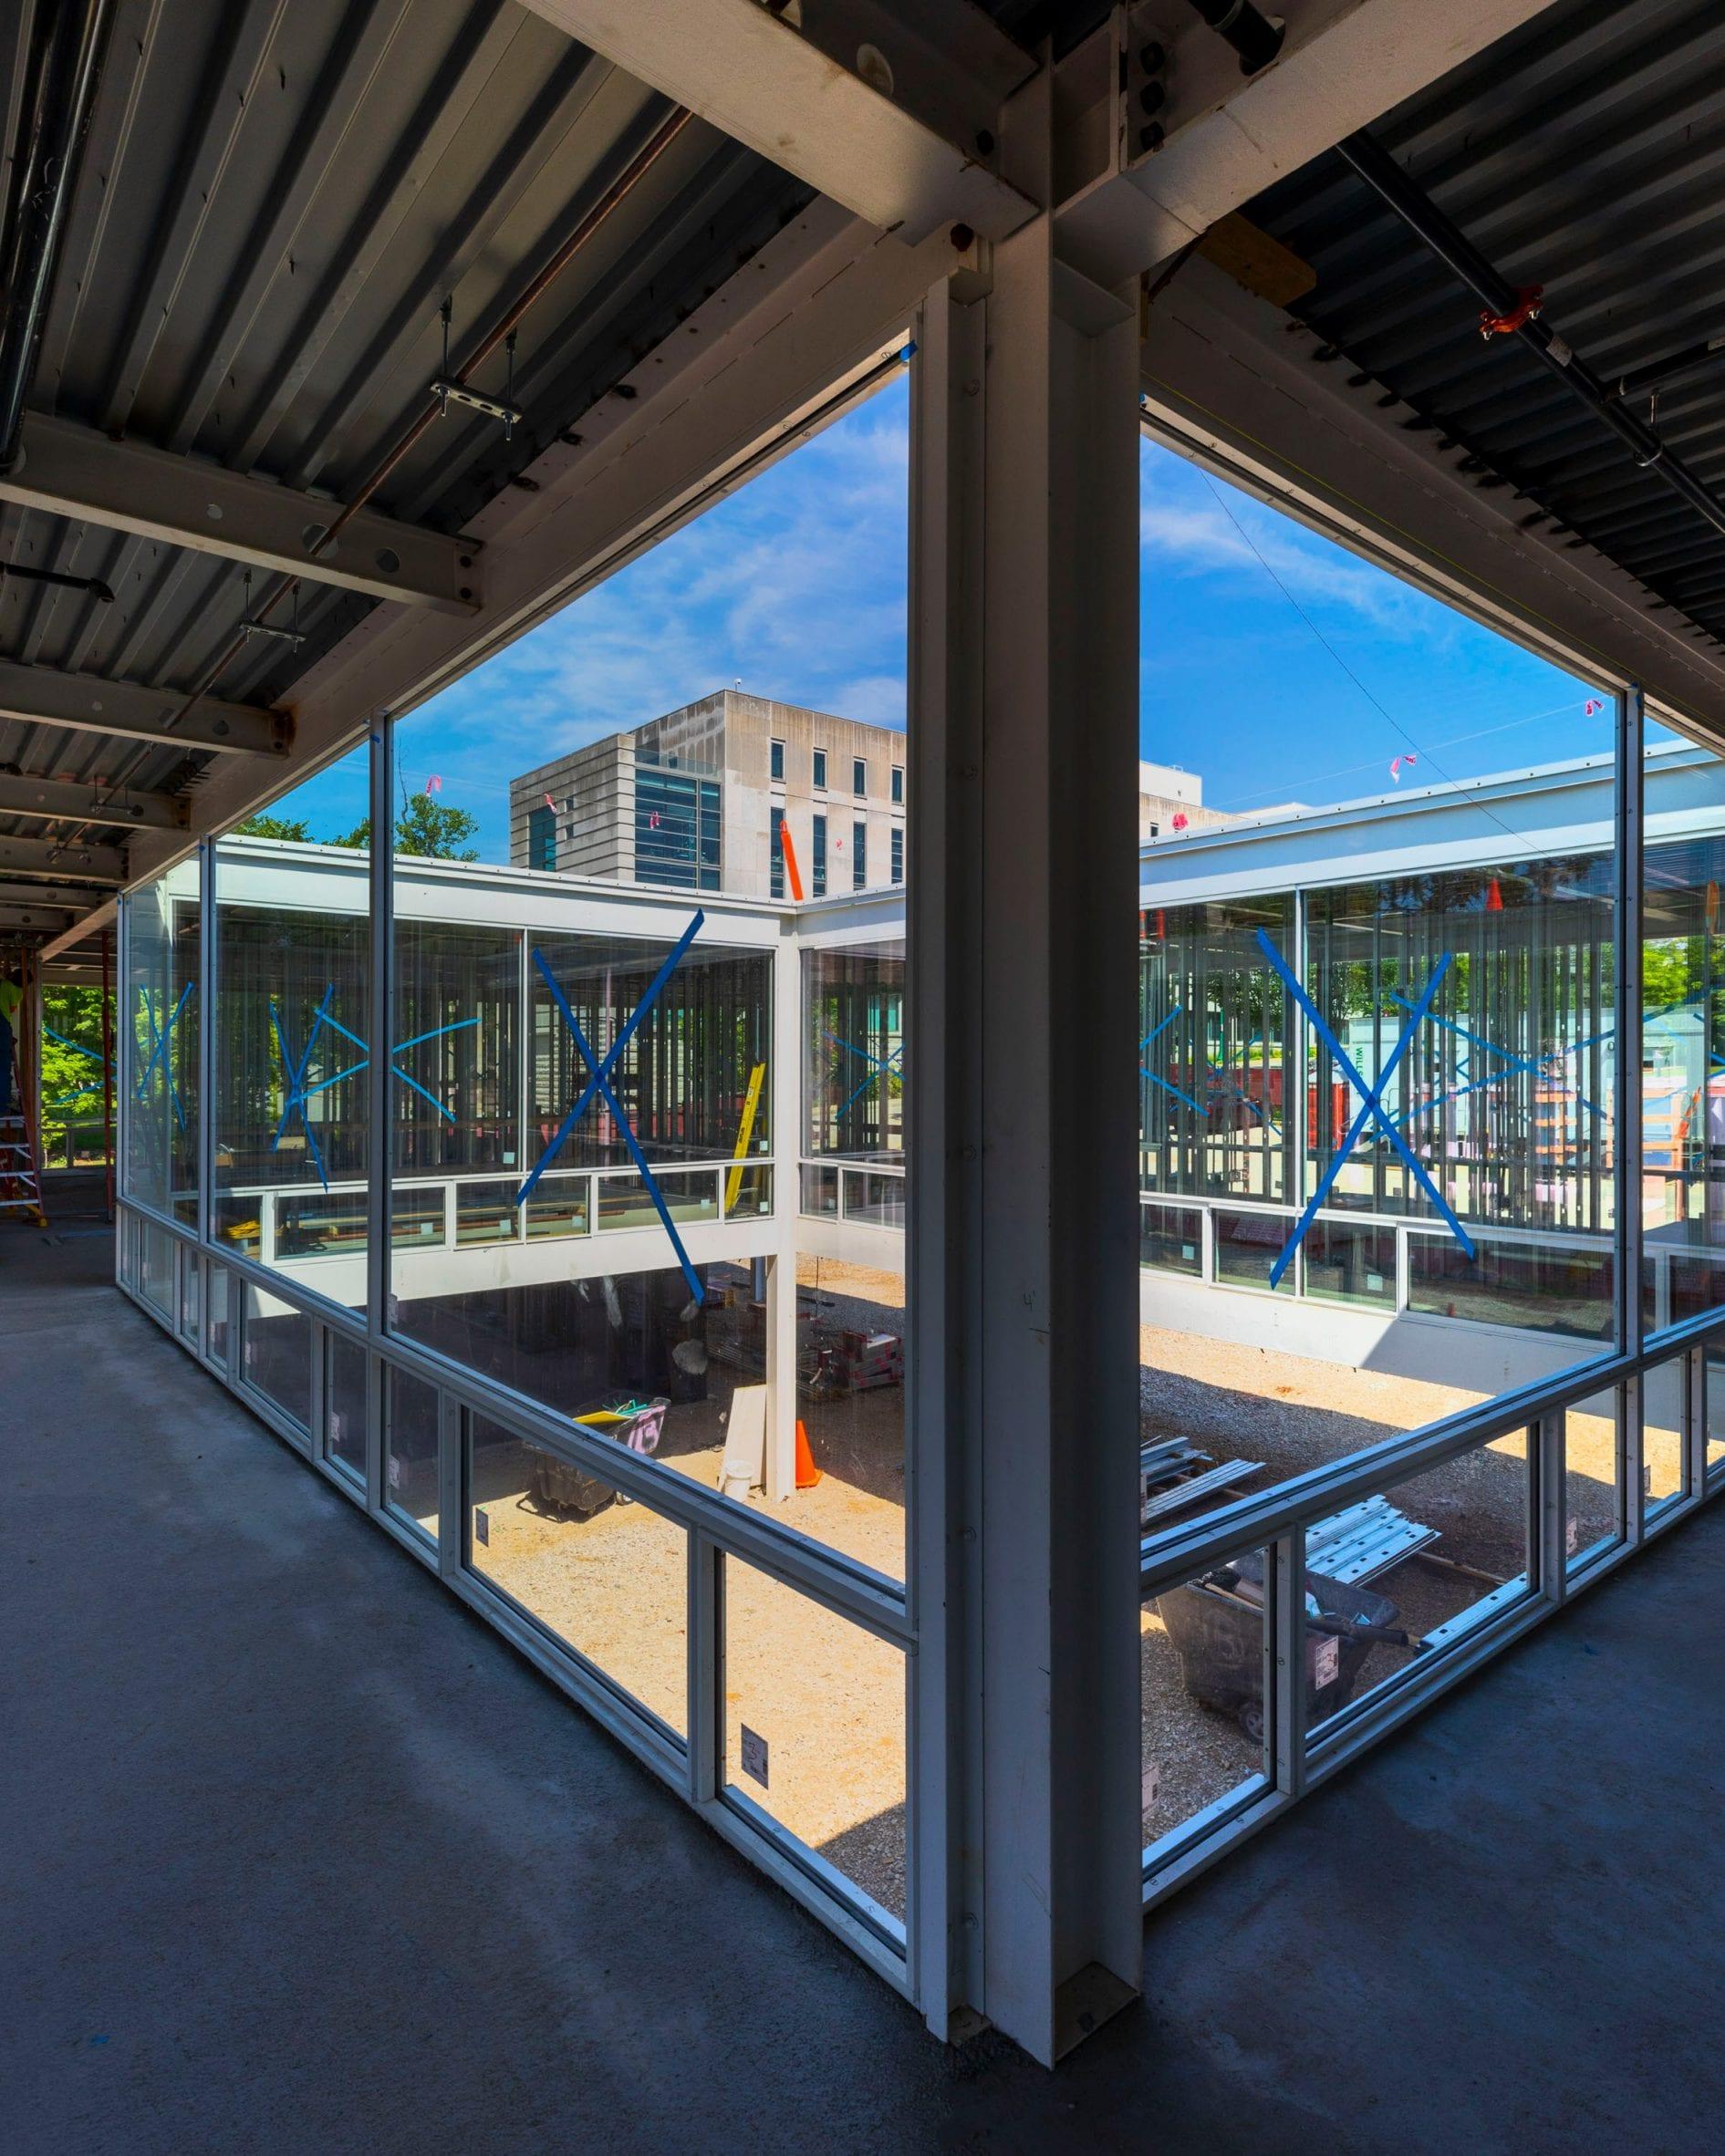 Mies Building for the Eskenazi School of Art, Architecture + Design under construction